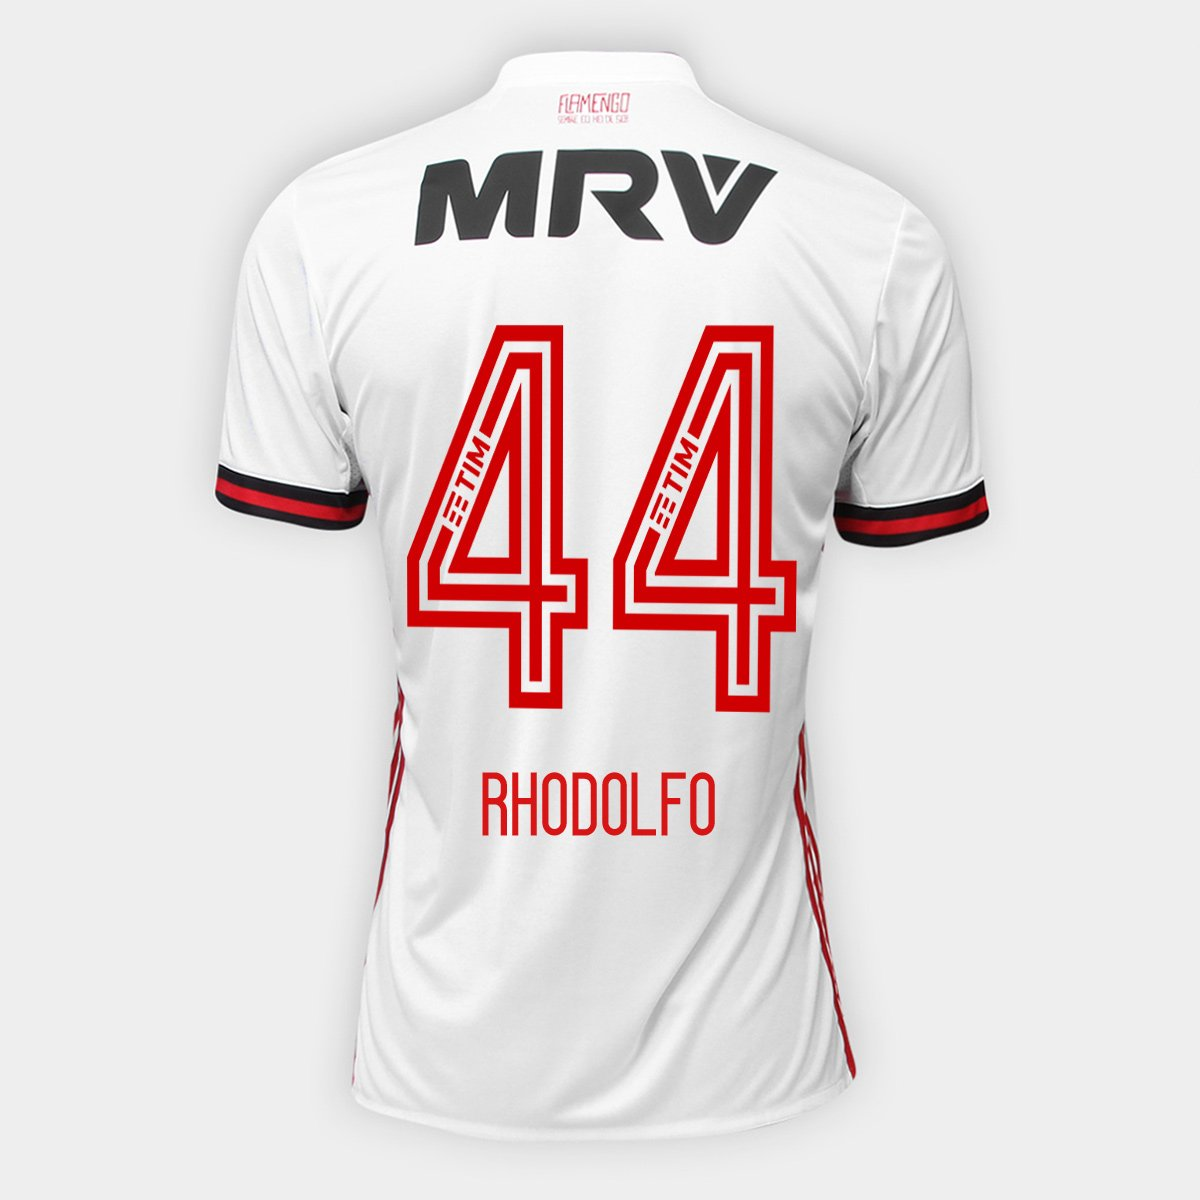 Camisa Flamengo II 17 18 N° 44 - Rhodolfo Torcedor Adidas Masculina -  Compre Agora  c054490d5f7e2